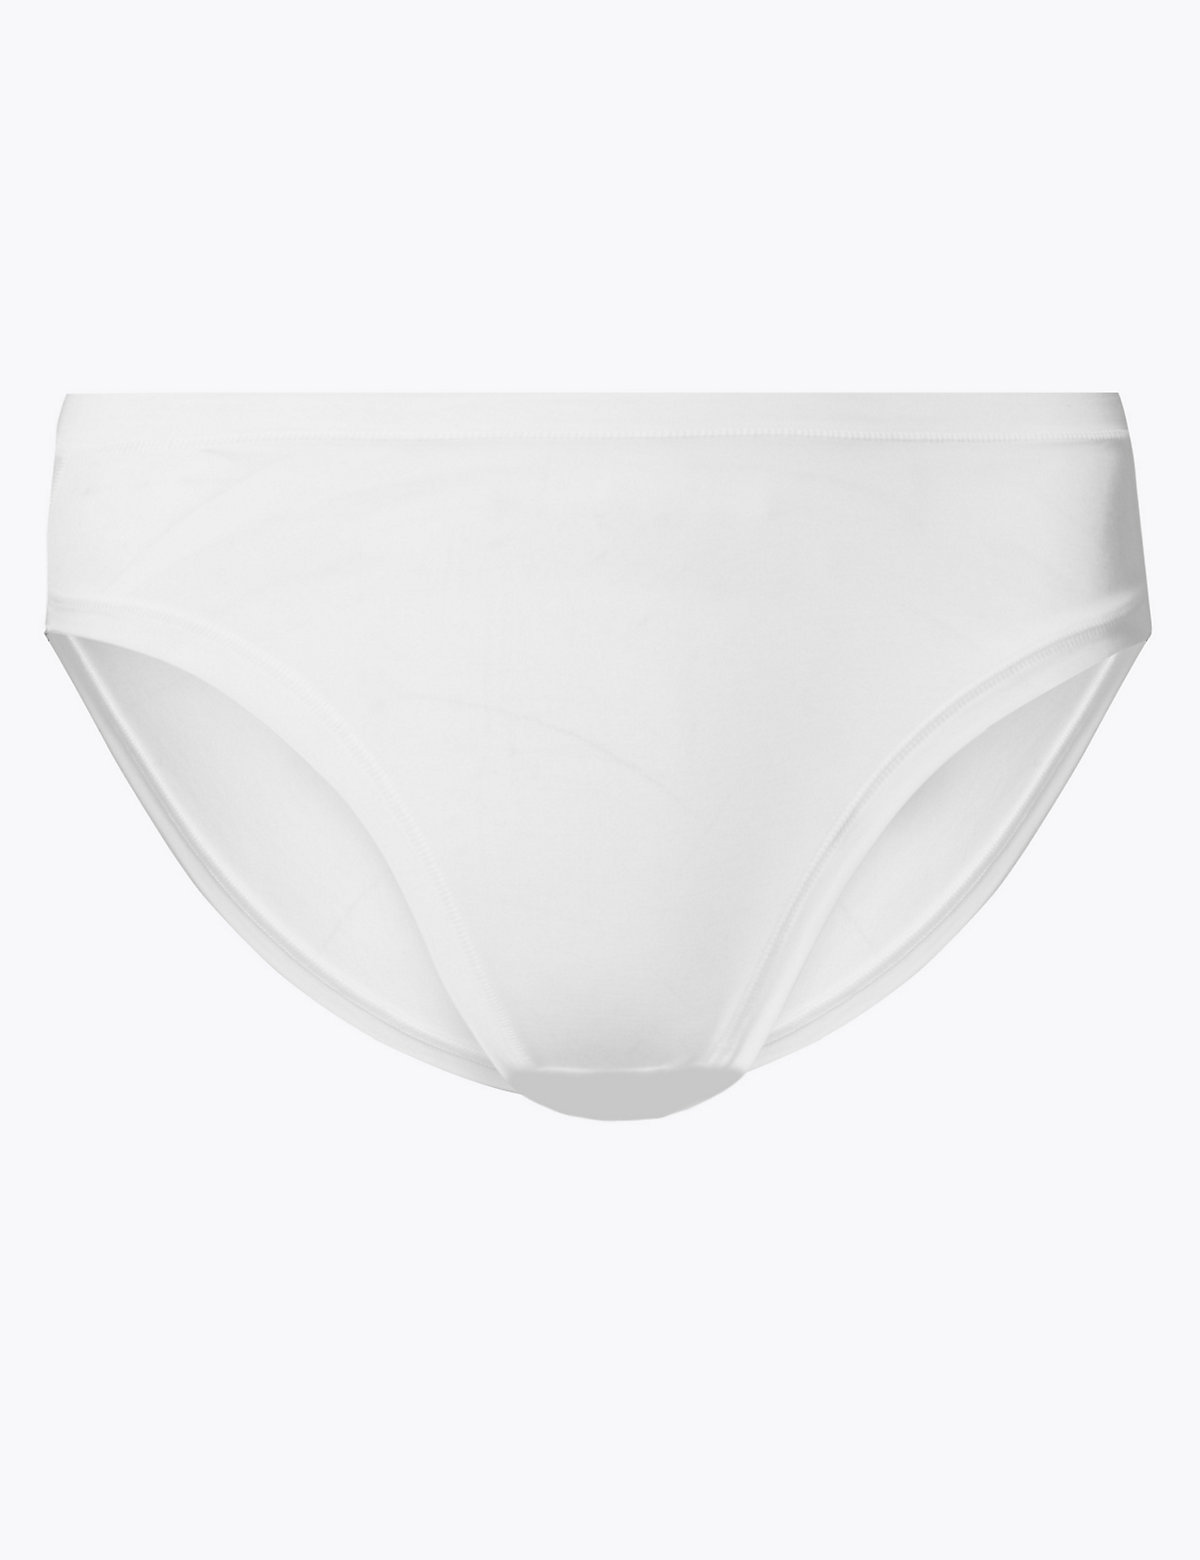 a256a2df4ad1 M&S Women's White Modal Rich Flexifit High Leg Knickers ...